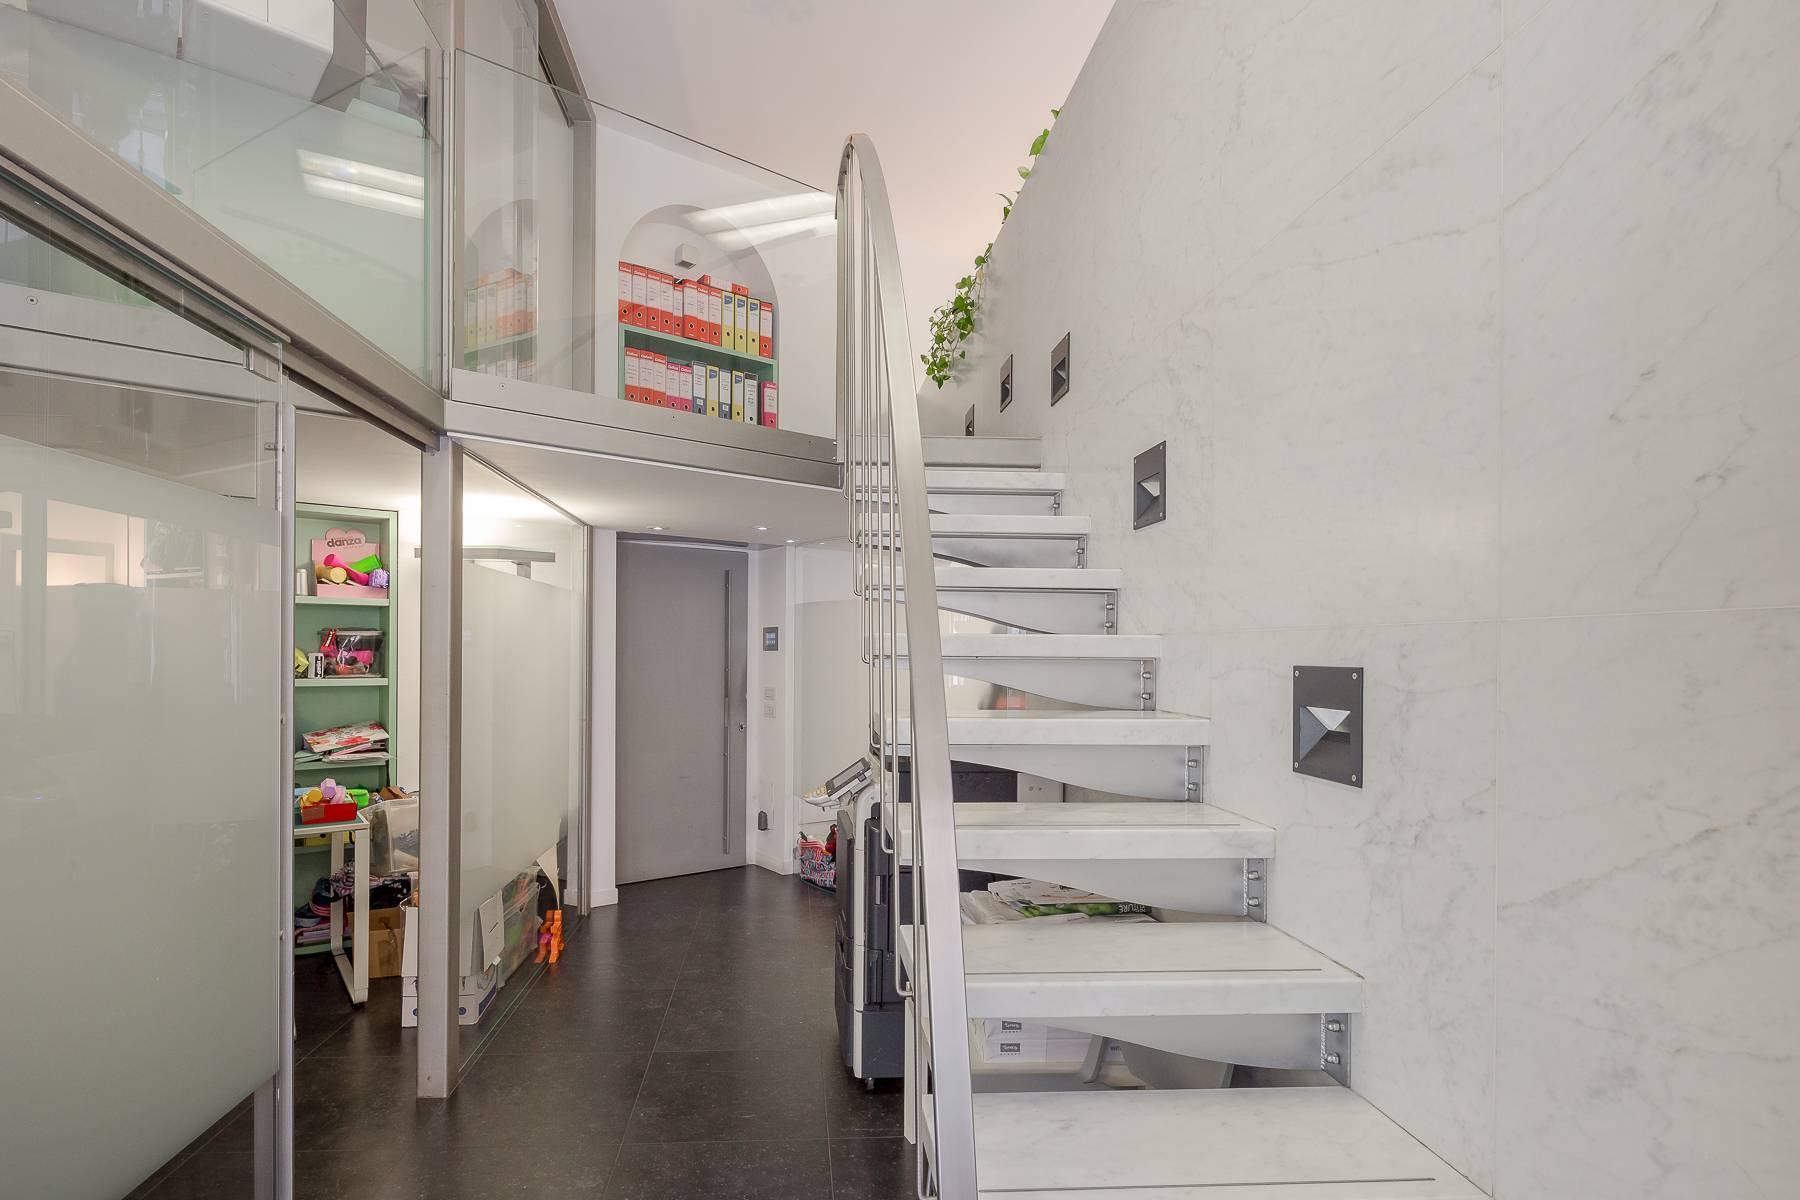 Open space office/residential property in Piazza Giovine Italia/Via Aurelio Saffi - 9